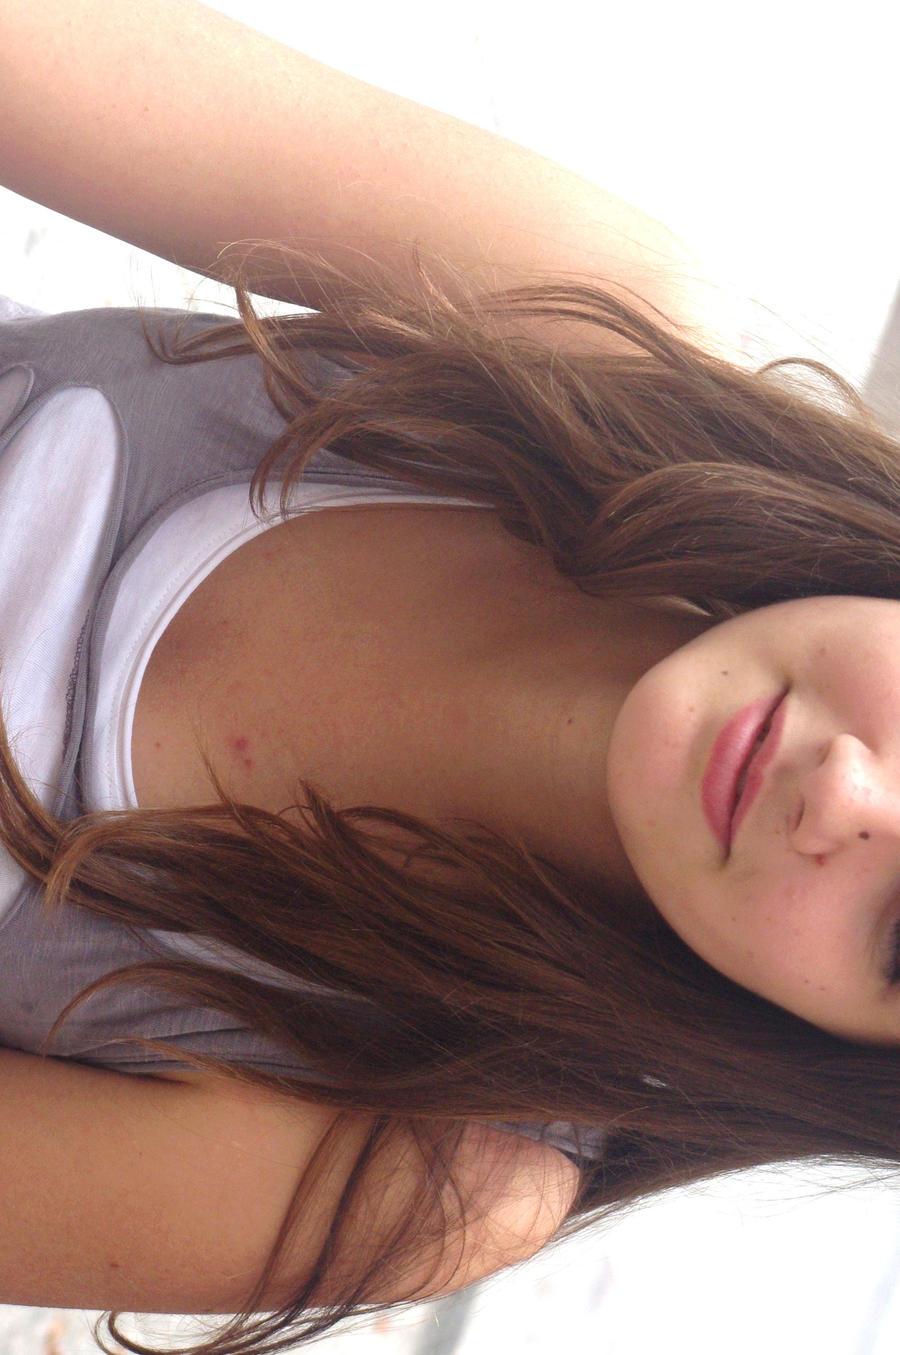 Beautiful French Girl By Pixbypix On Deviantart-7898